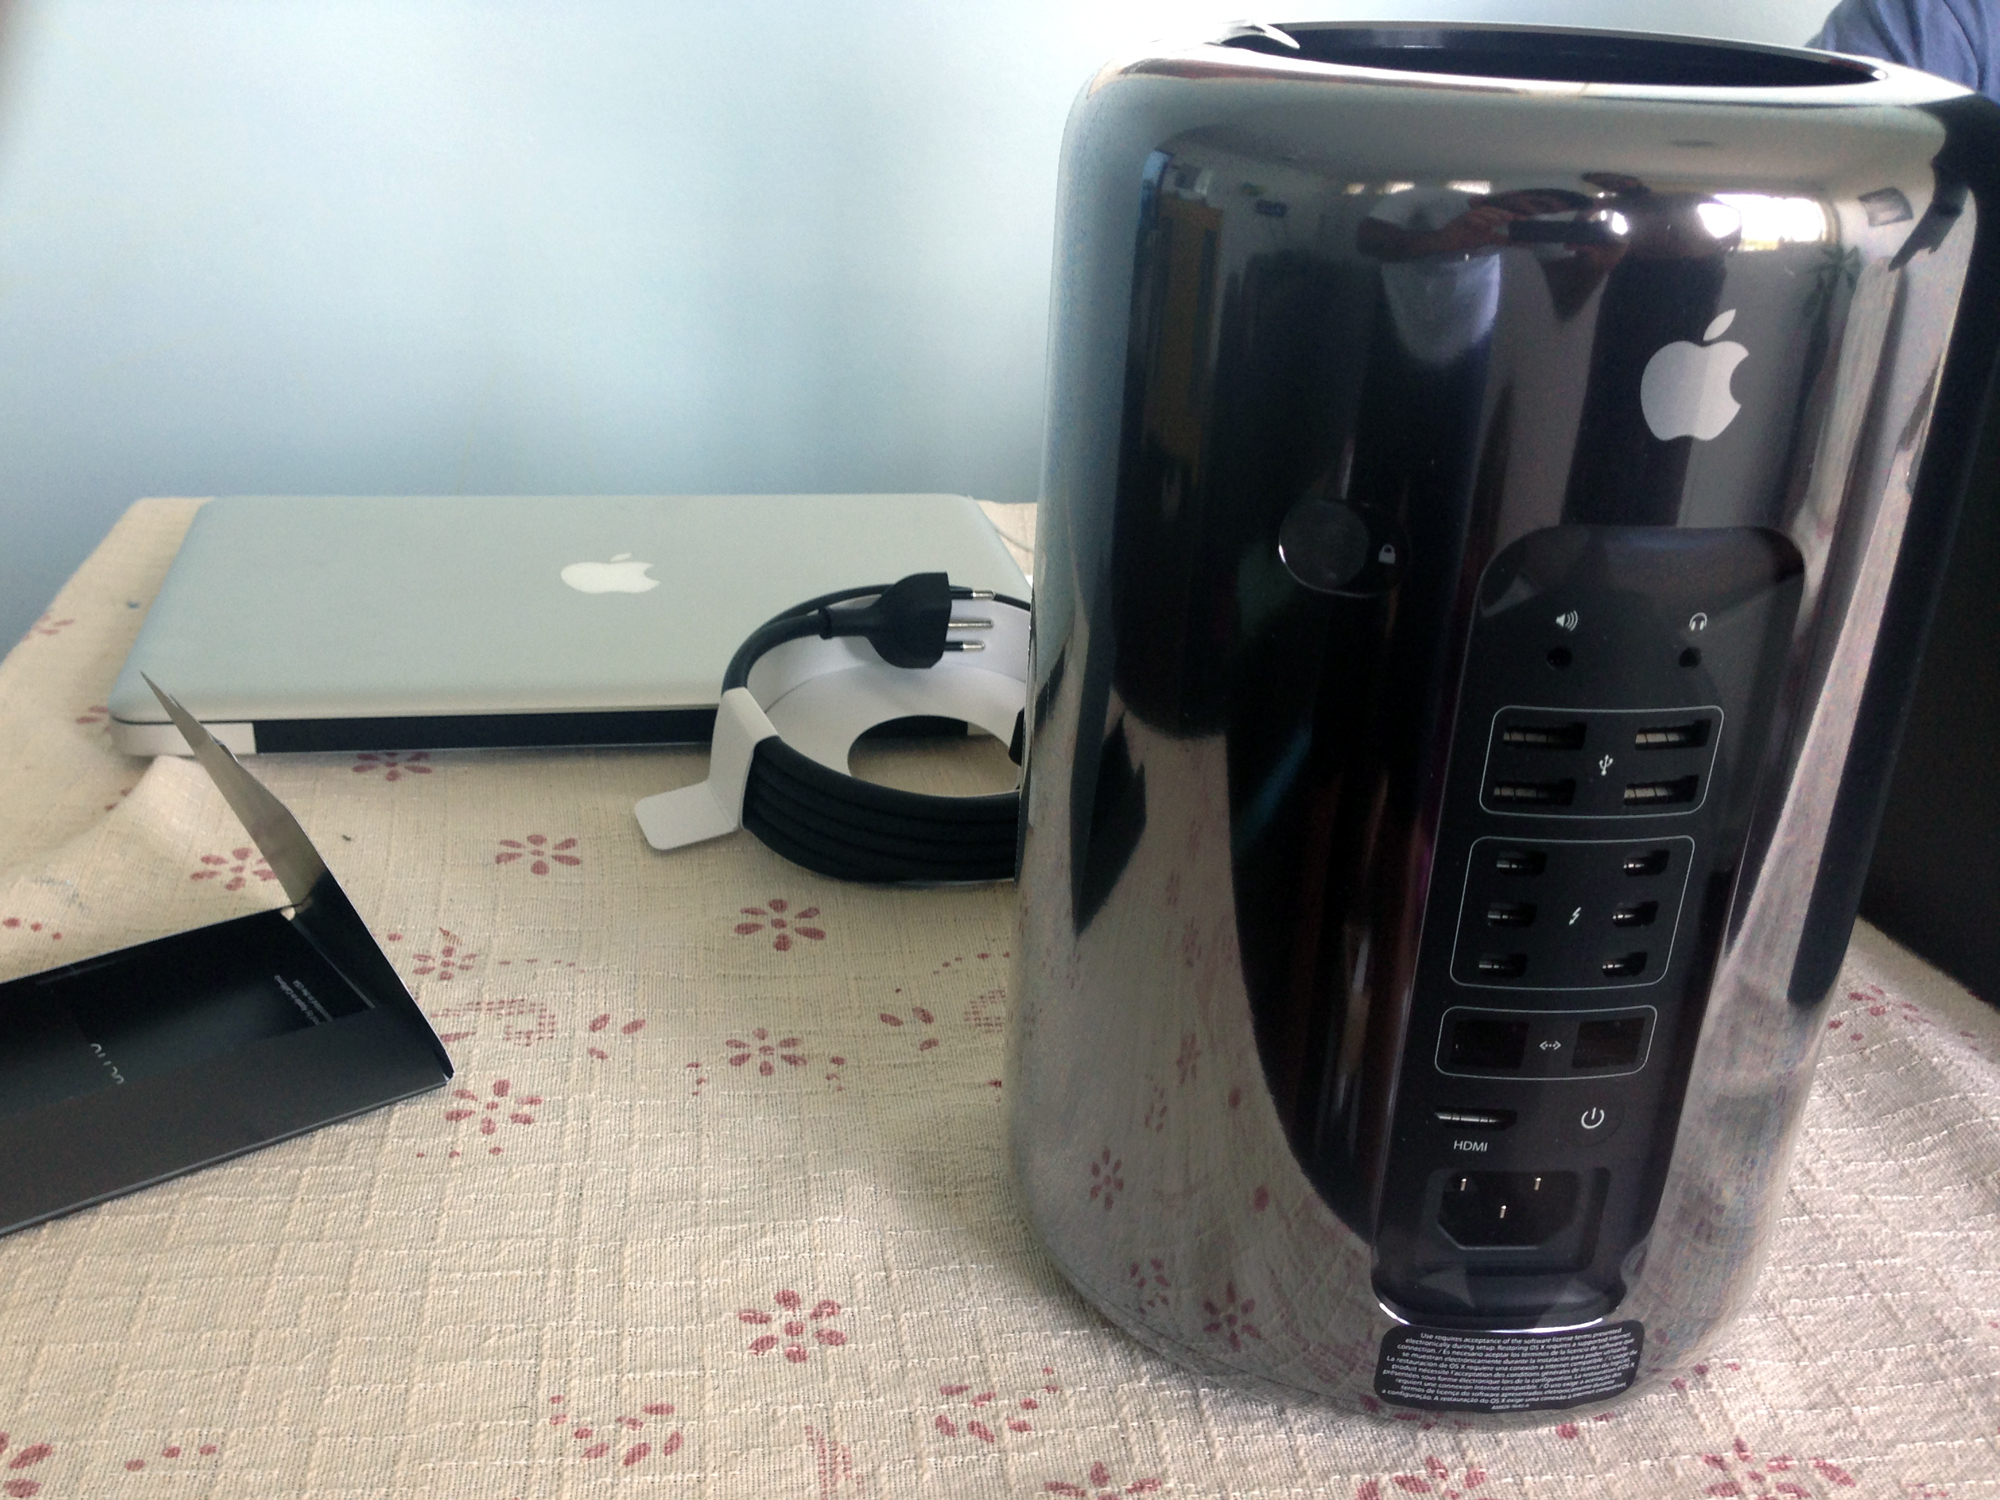 Novo Mac Pro em cima da mesa